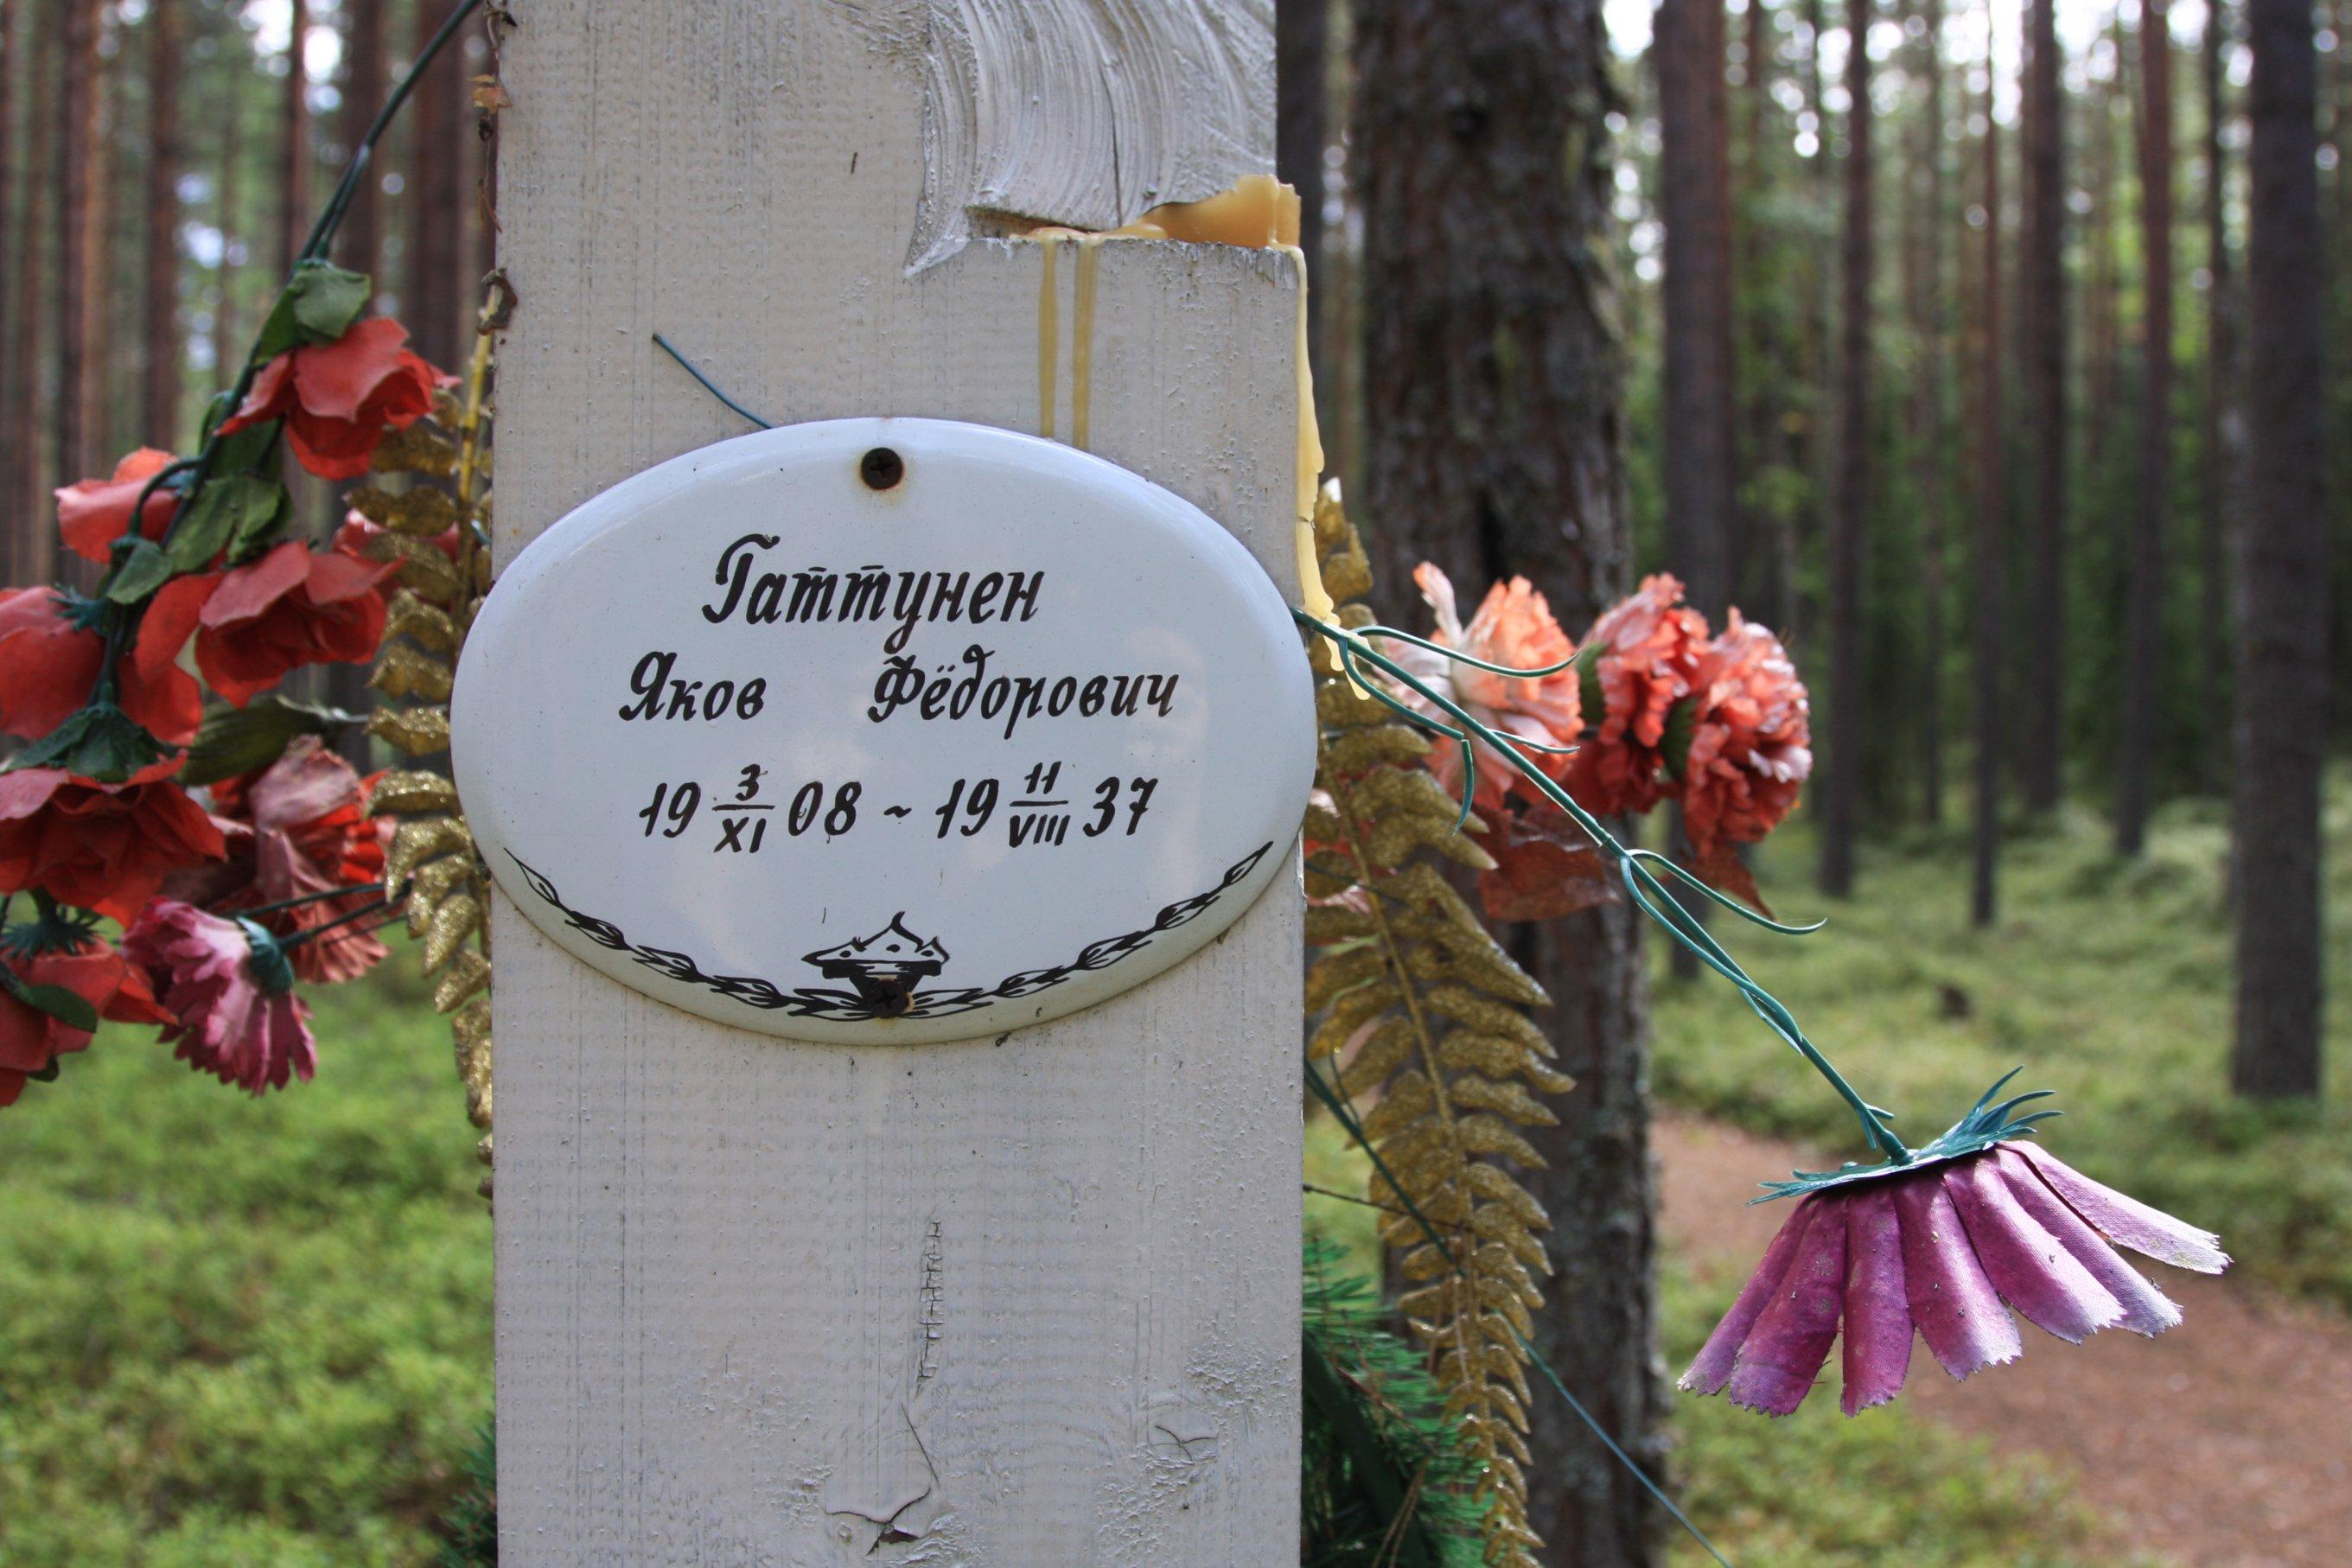 Памятная табличка «Гаттунен Яков Фёдорович». Фото 04.08.2018.